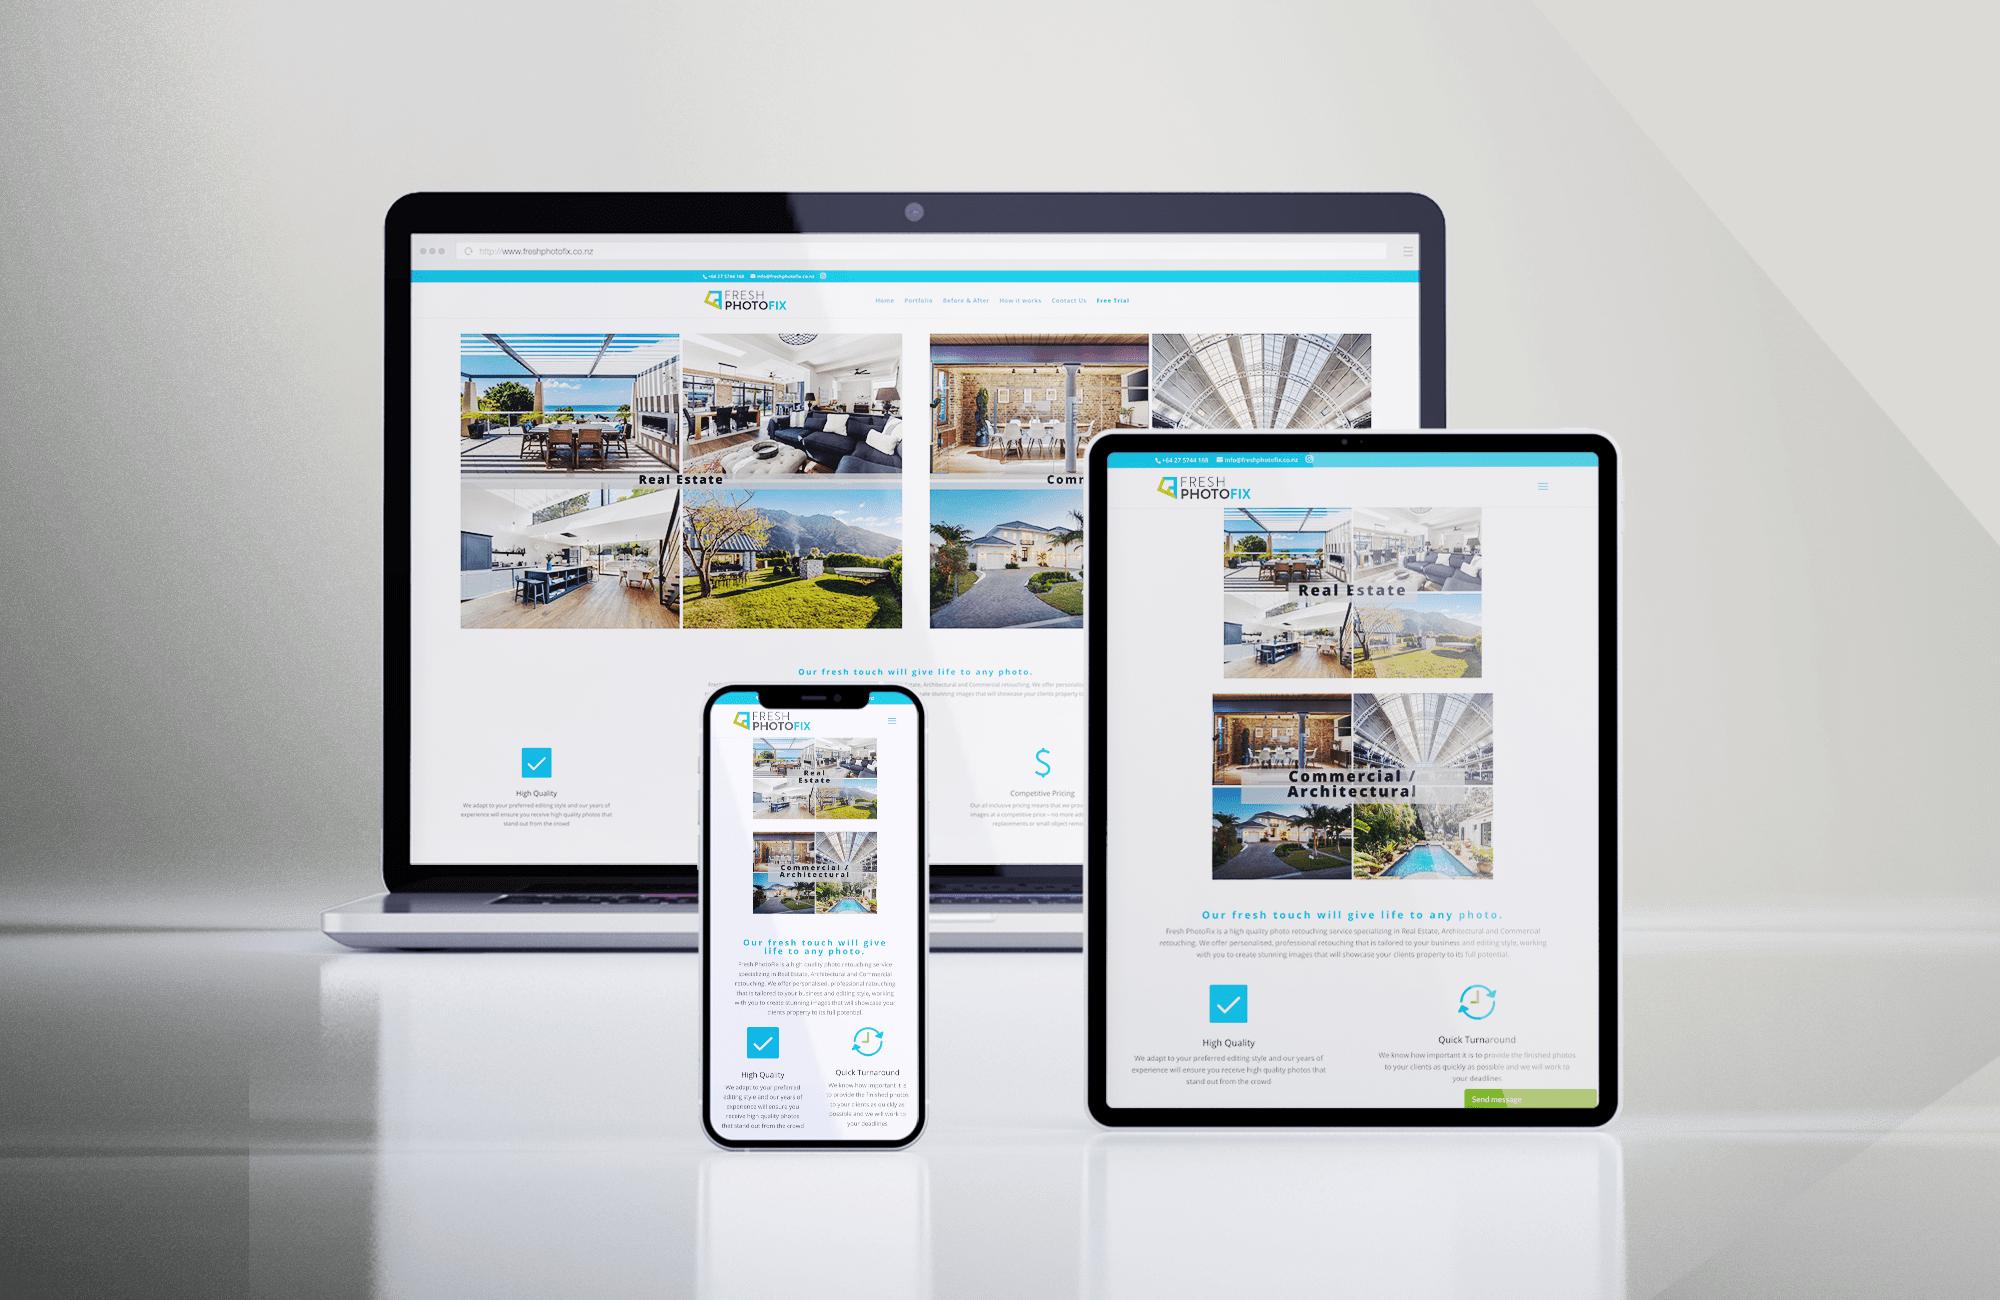 Fresh PhotoFix website designed by Harpr Surveyors